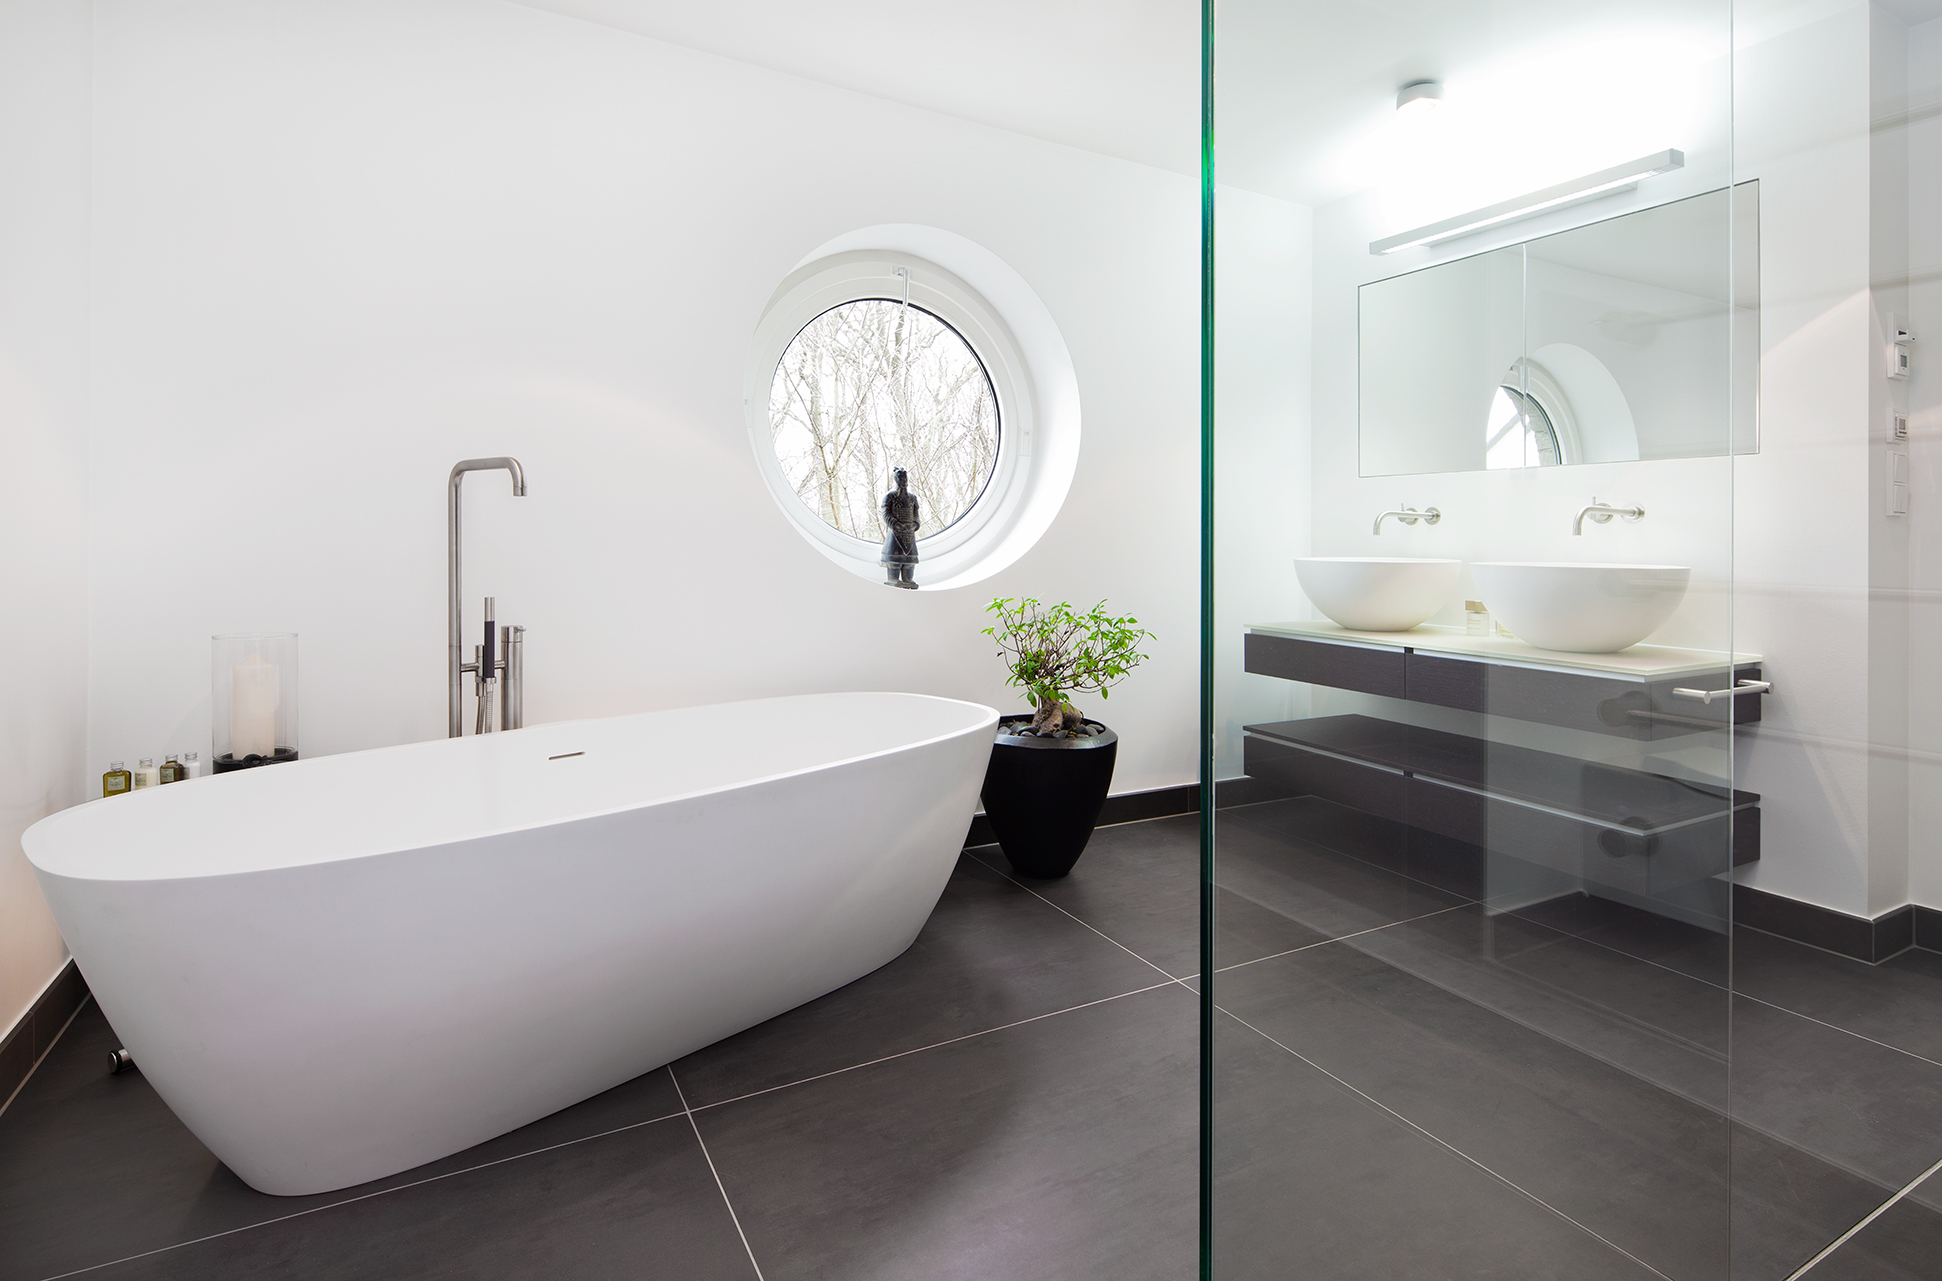 steinr cke fsb gmbh bad raum in perfektion design. Black Bedroom Furniture Sets. Home Design Ideas